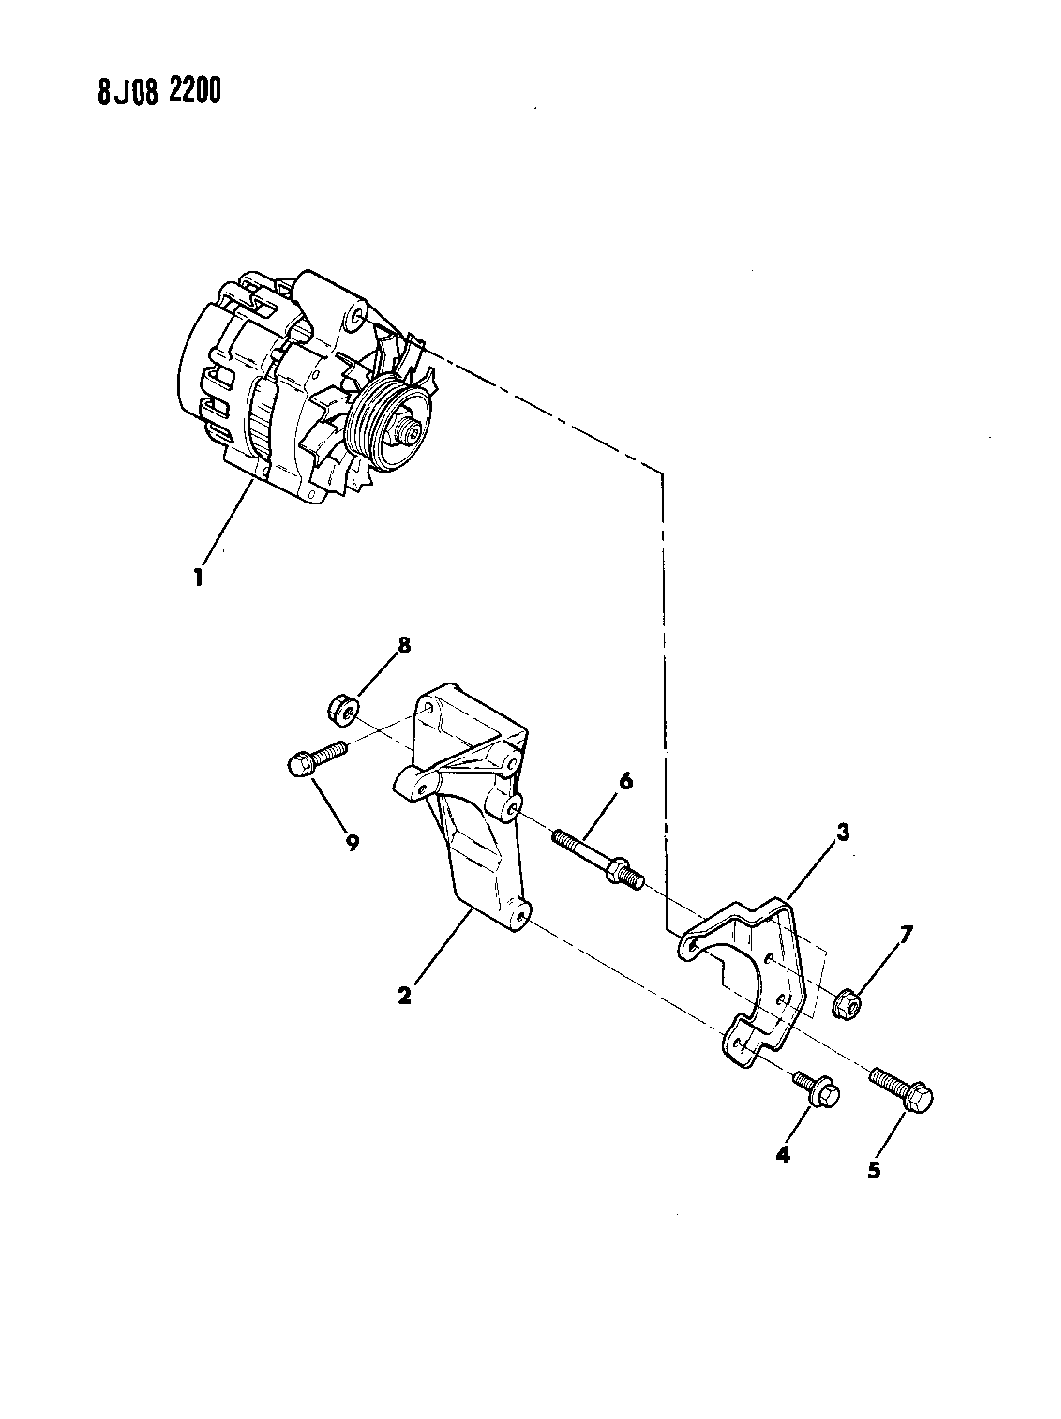 1989 Jeep Wrangler Alternator & Mounting - Thumbnail 2